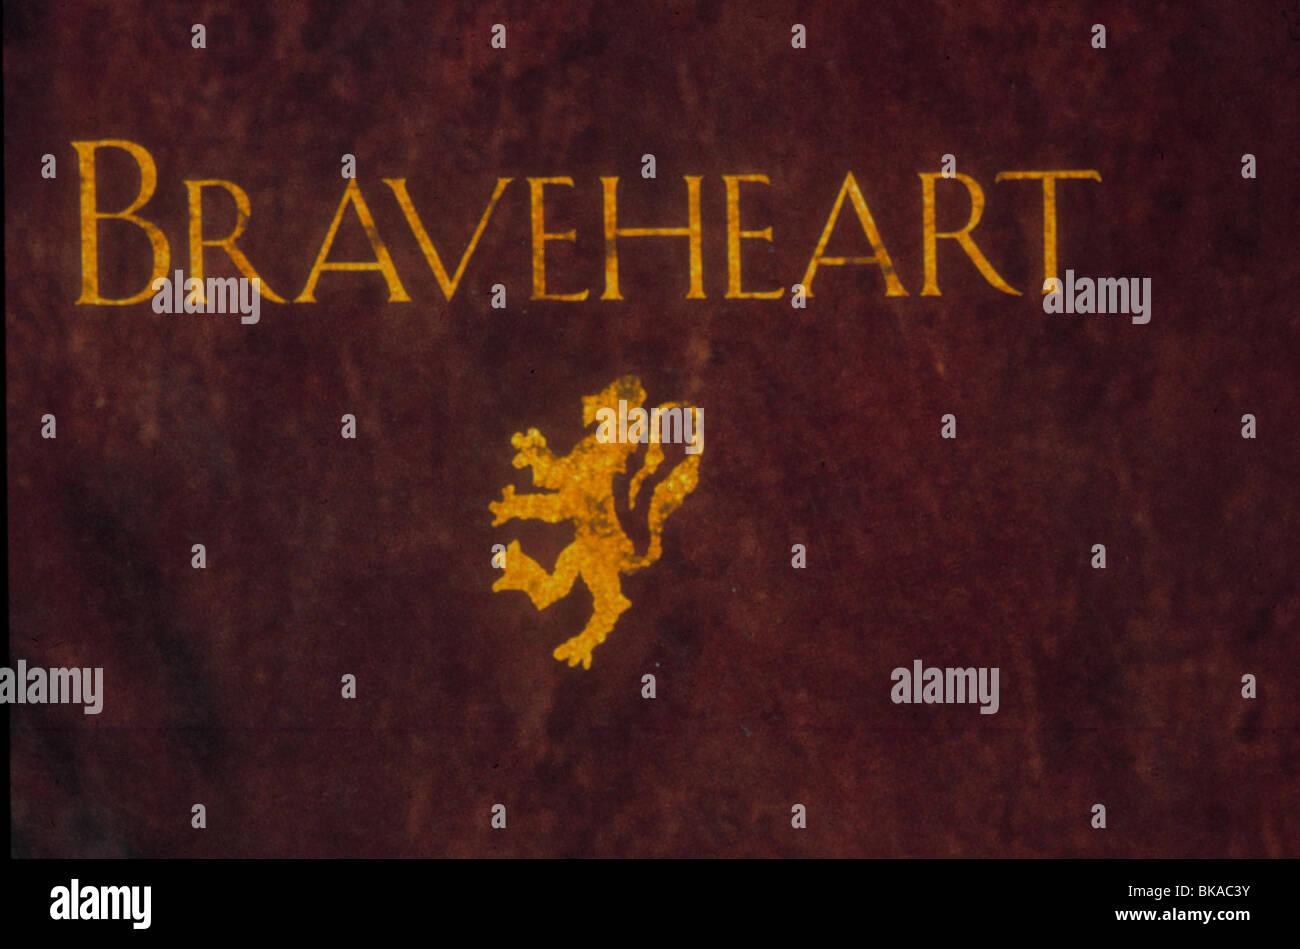 BRAVEHEART -1995 POSTER - Stock Image